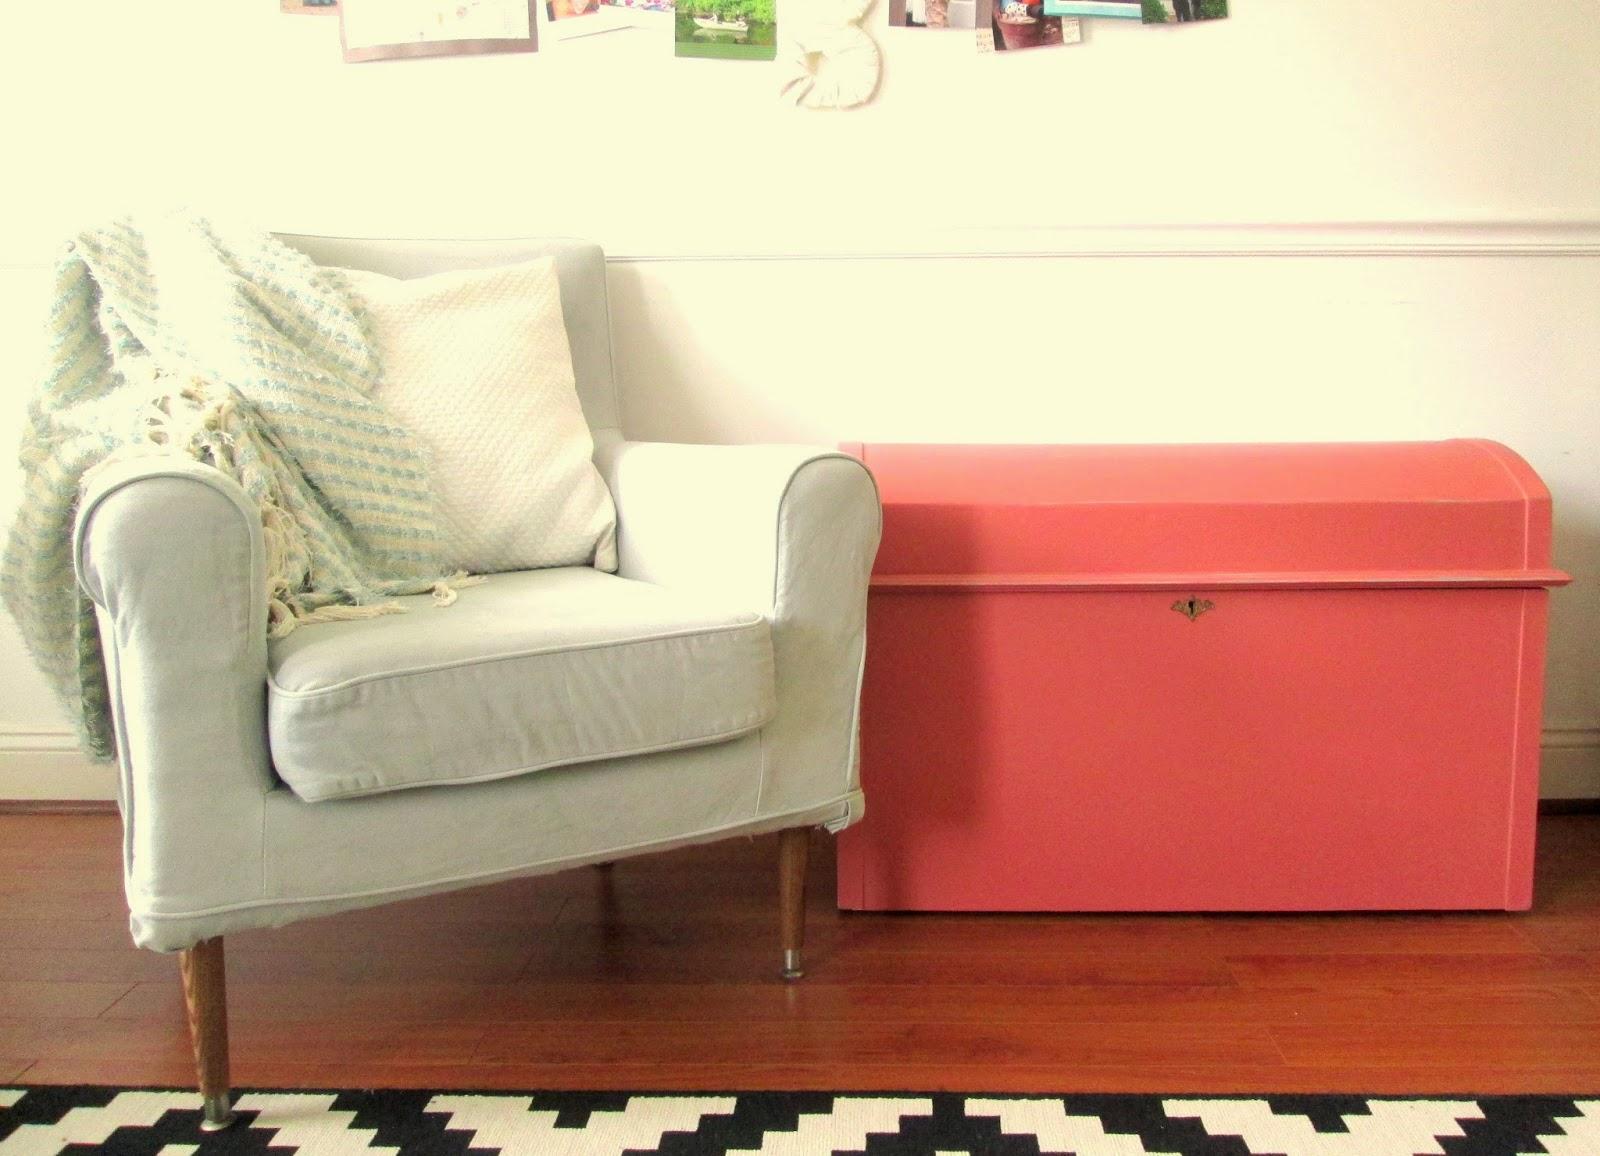 pink+trunk2.jpg